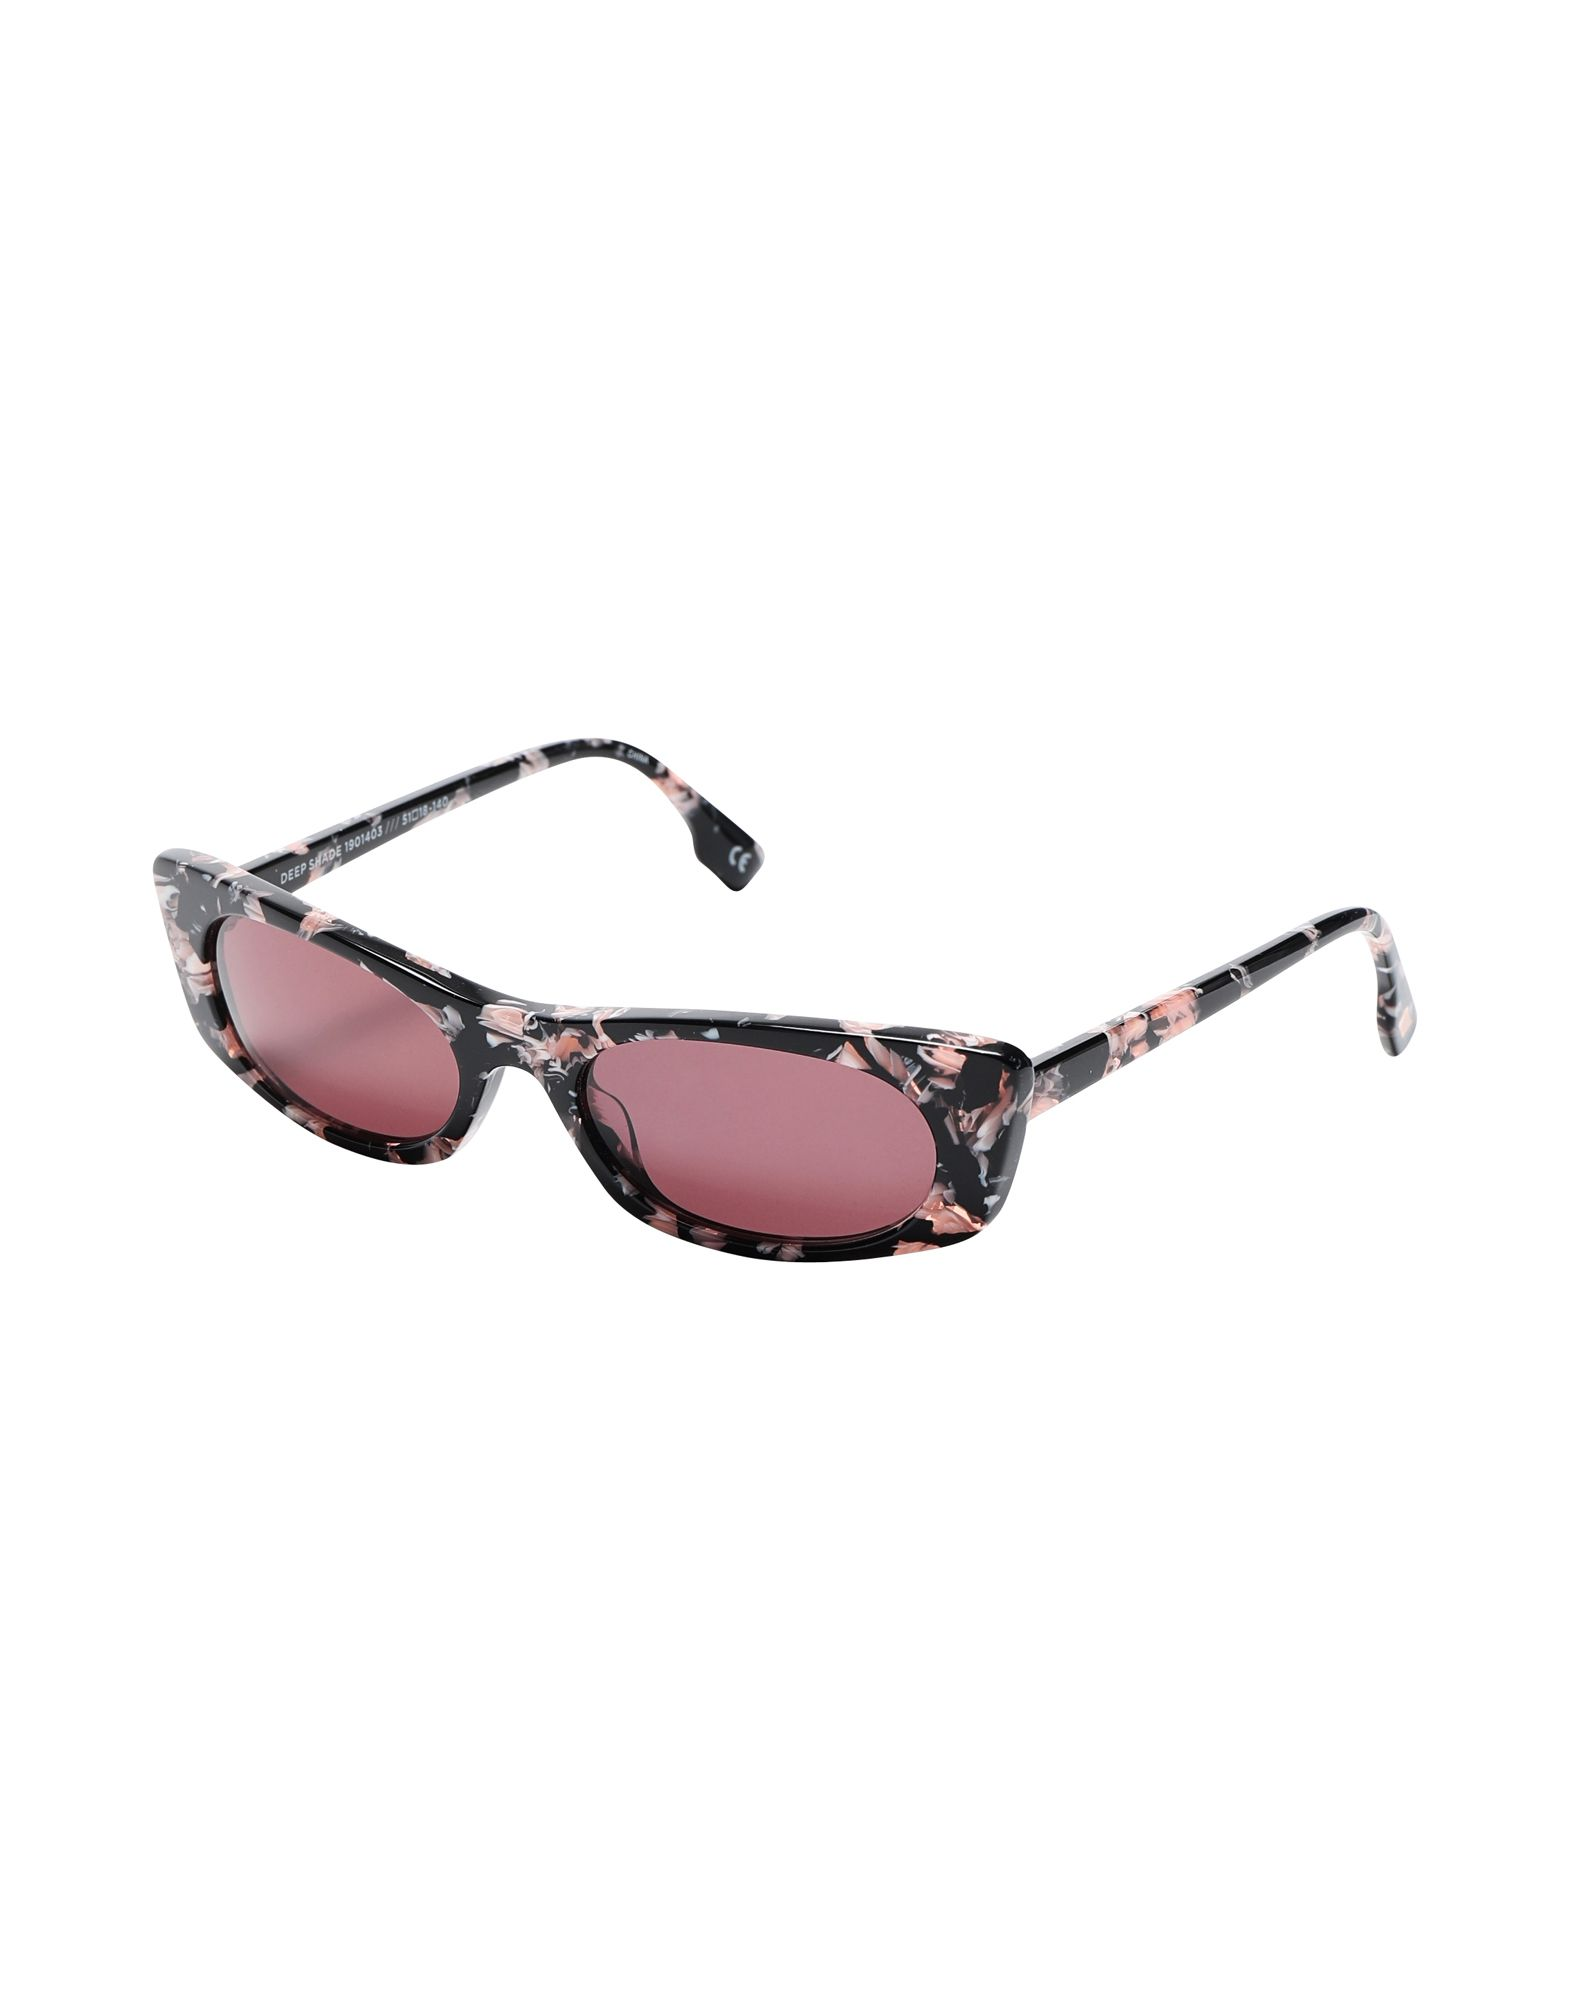 LE SPECS Солнечные очки очки рисунок